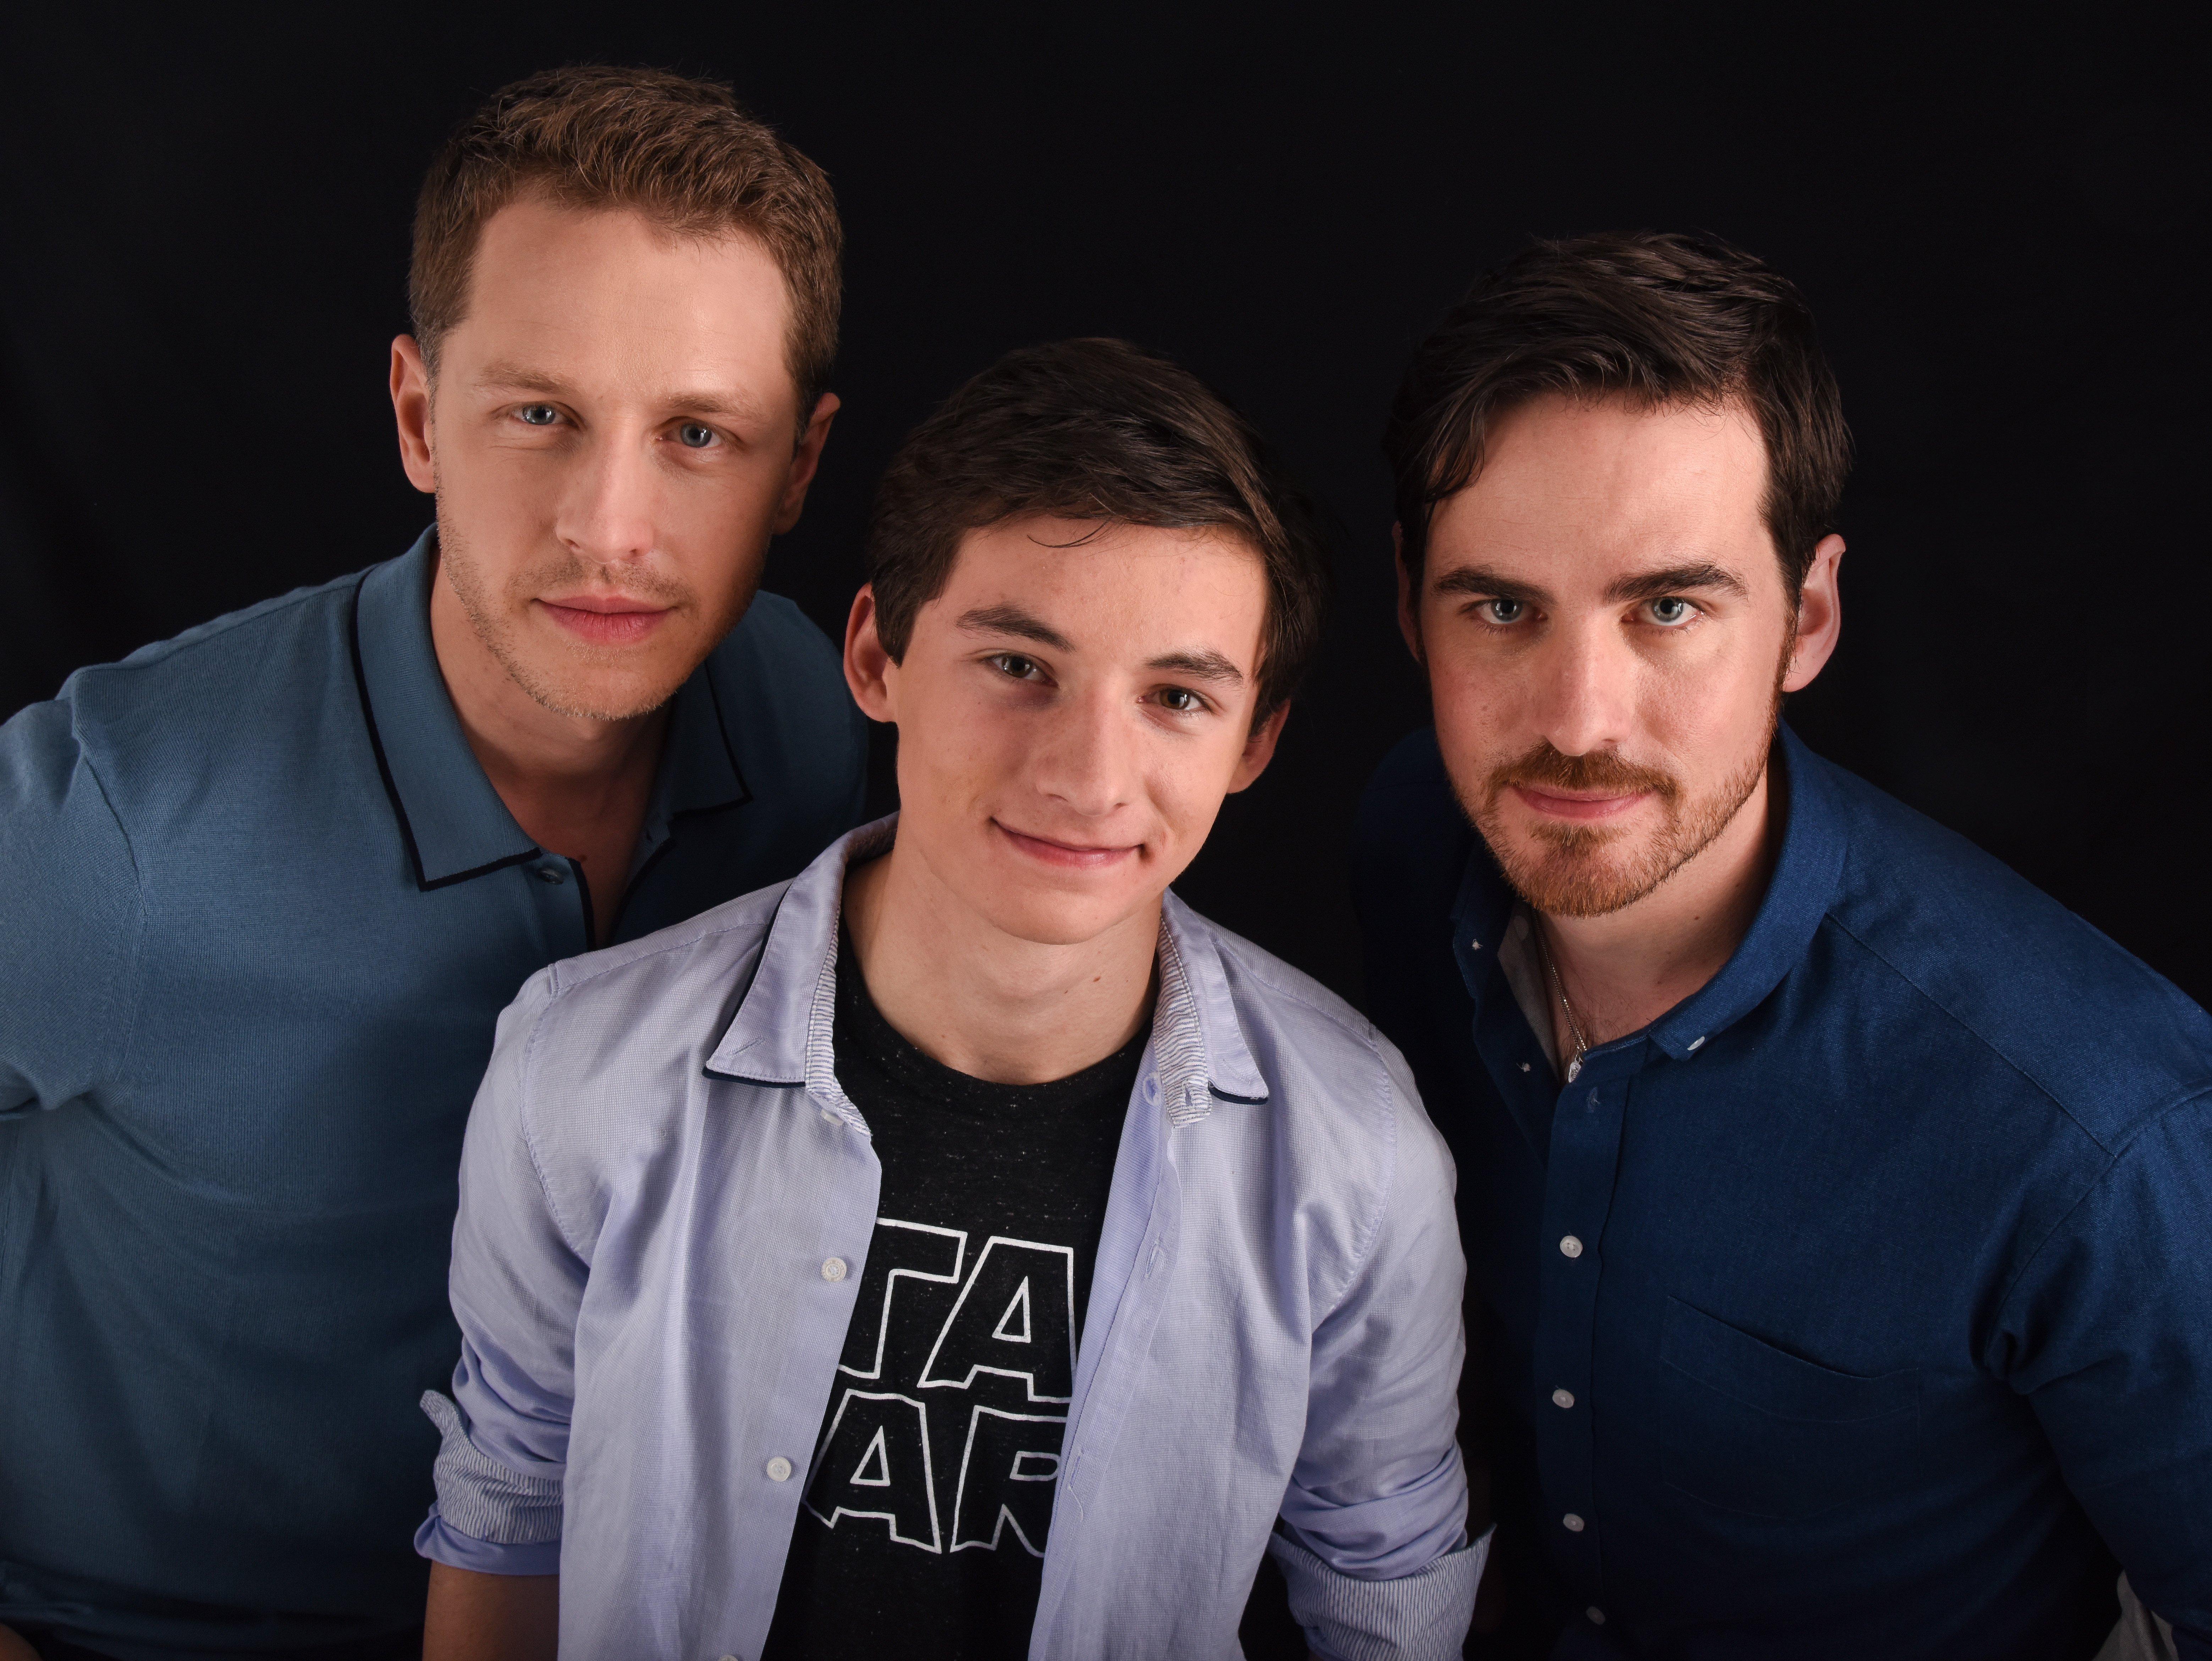 Colin, Josh and Jared | SDCC 2016